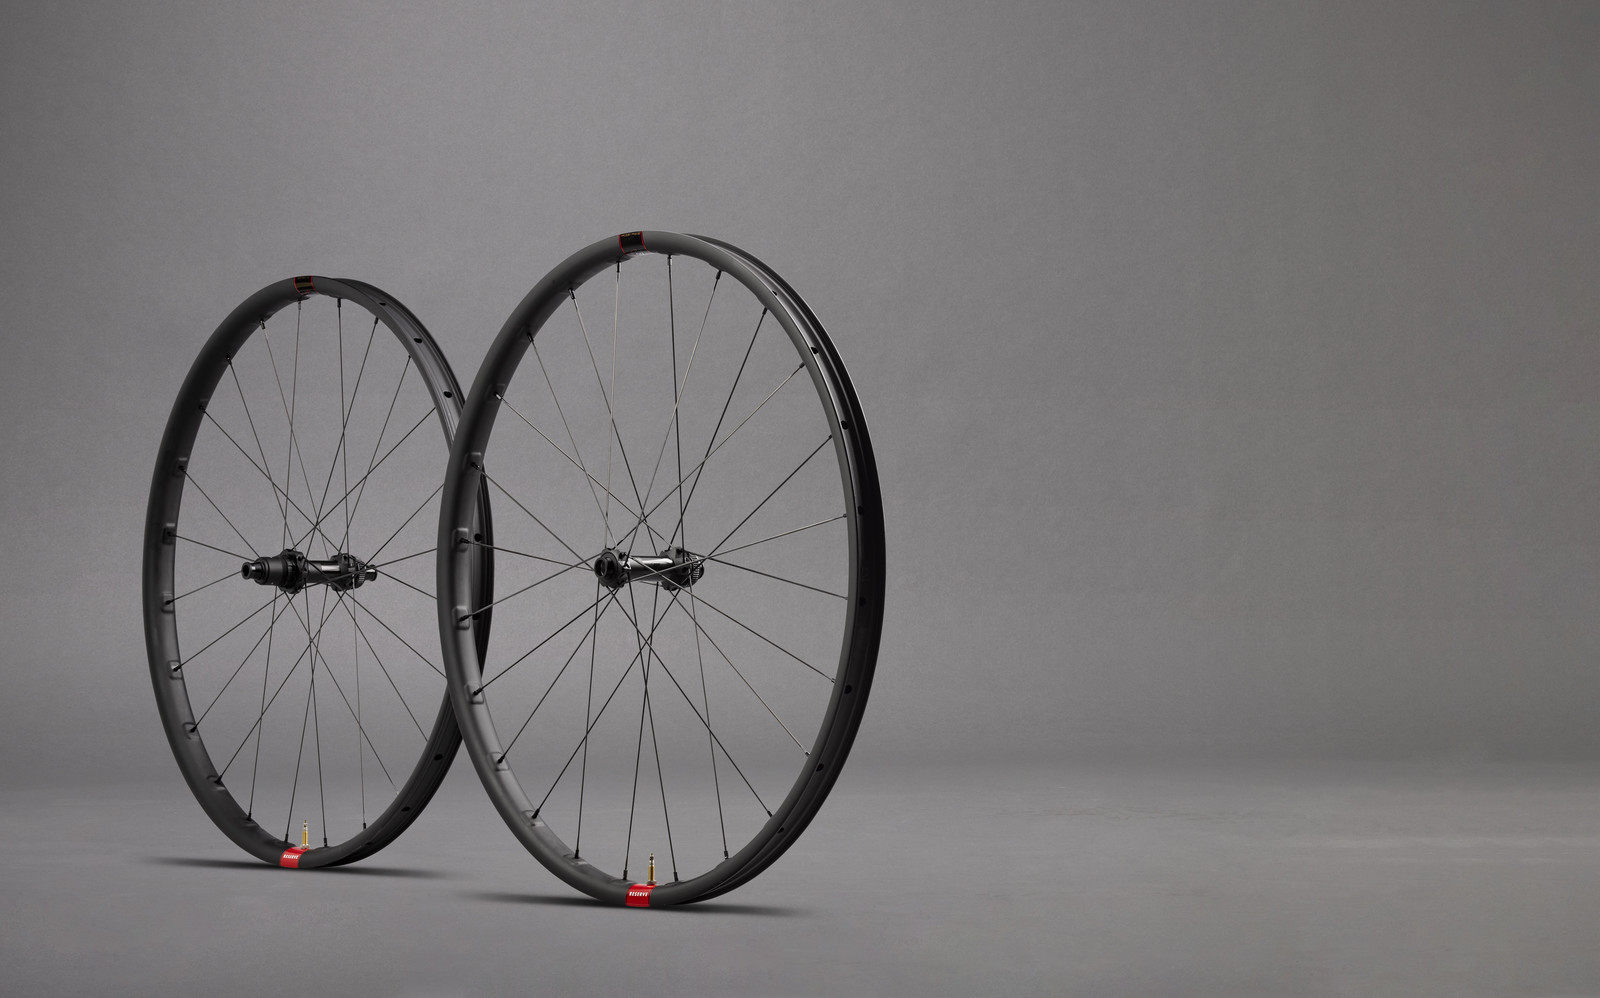 Reserve 28 XC Wheels